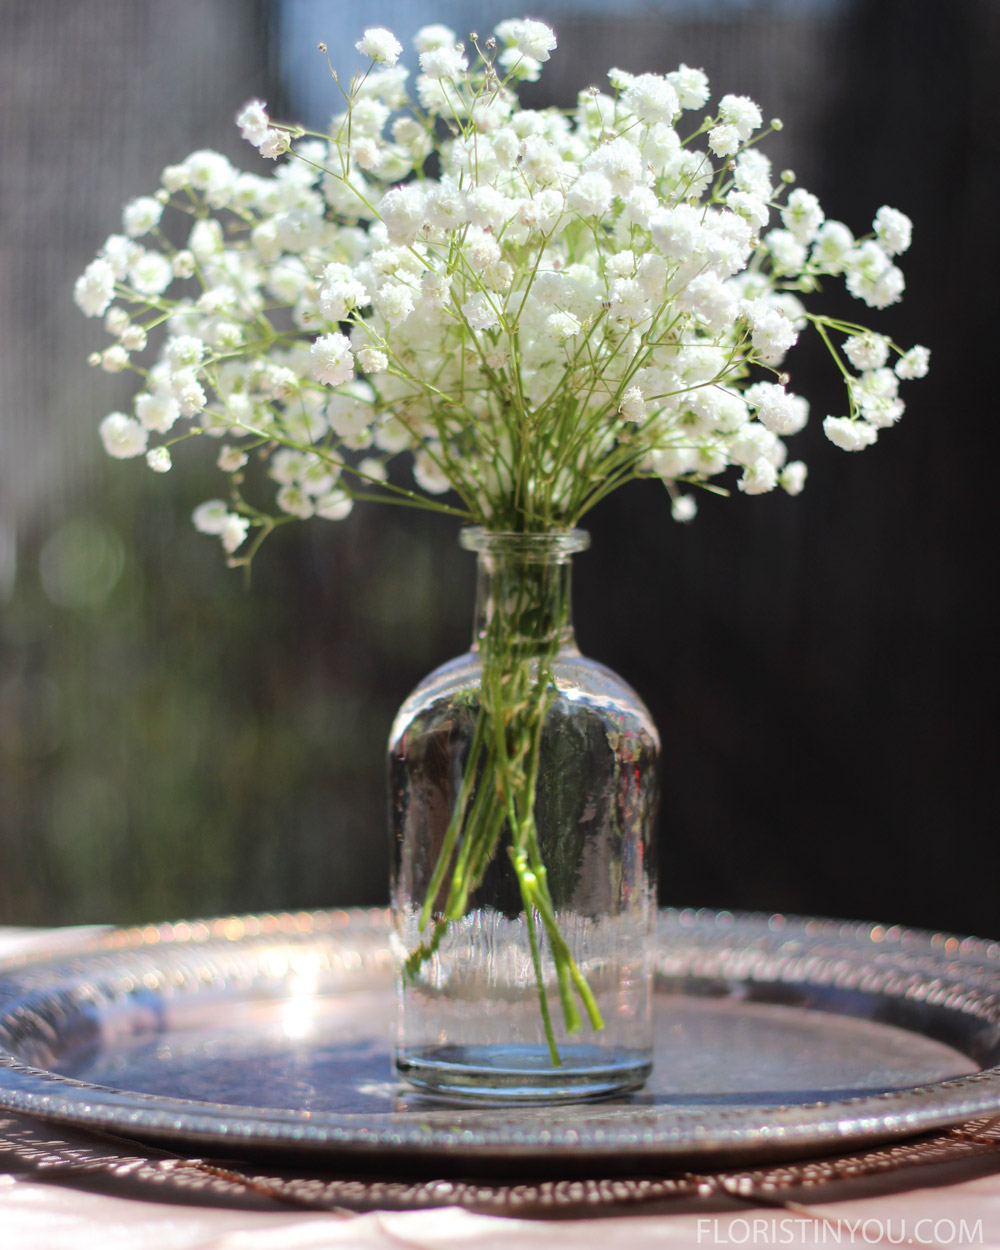 5 Beautiful Ways To Use Narrow Neck Vases Floristinyou with regard to measurements 1000 X 1250